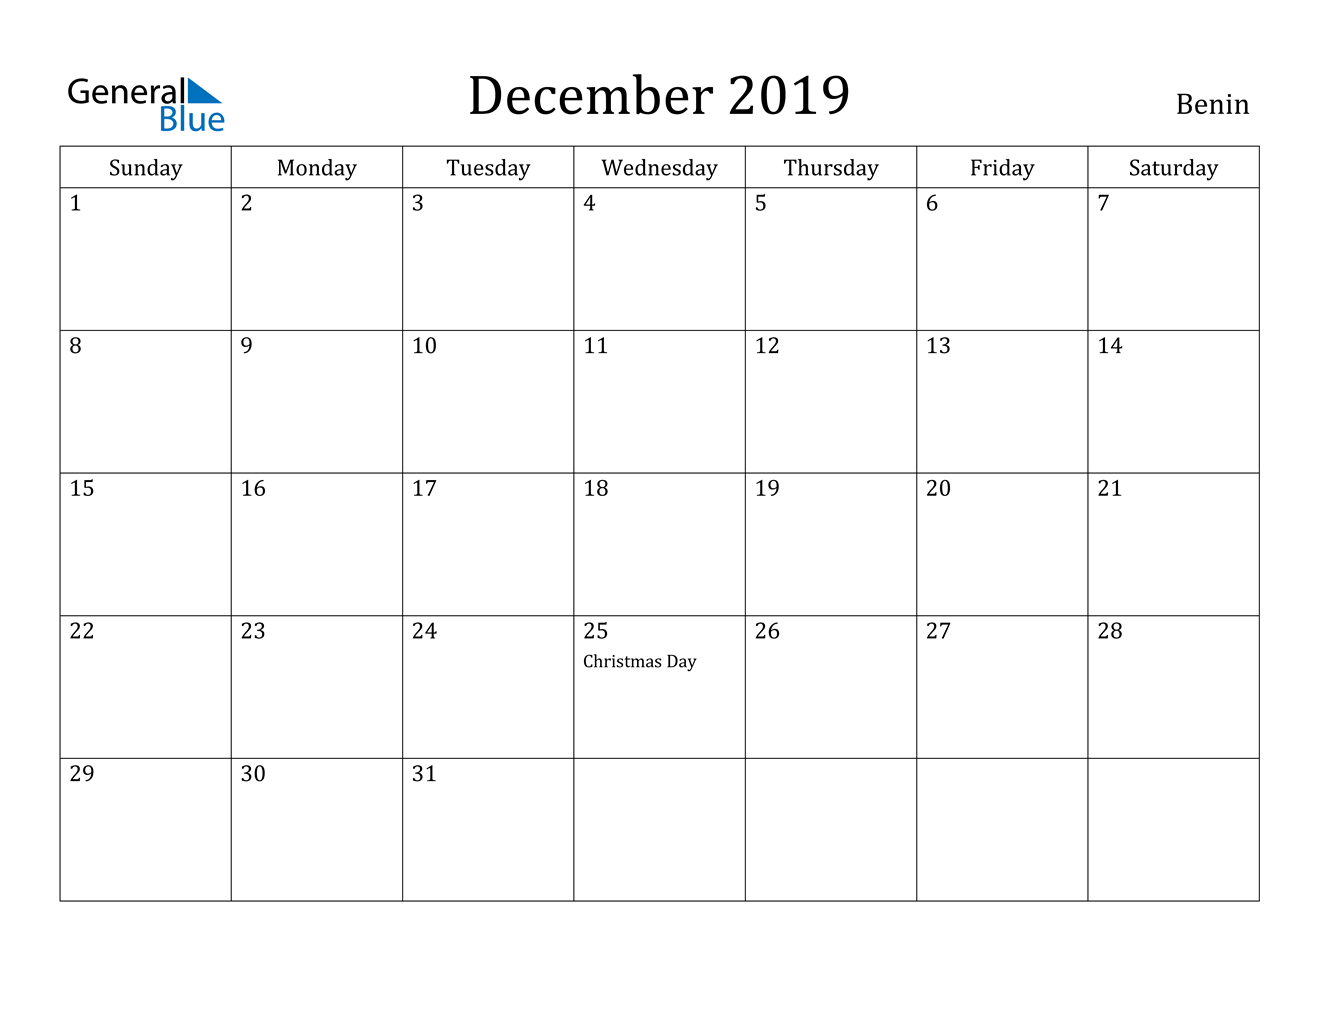 Image of December 2019 Benin Calendar with Holidays Calendar